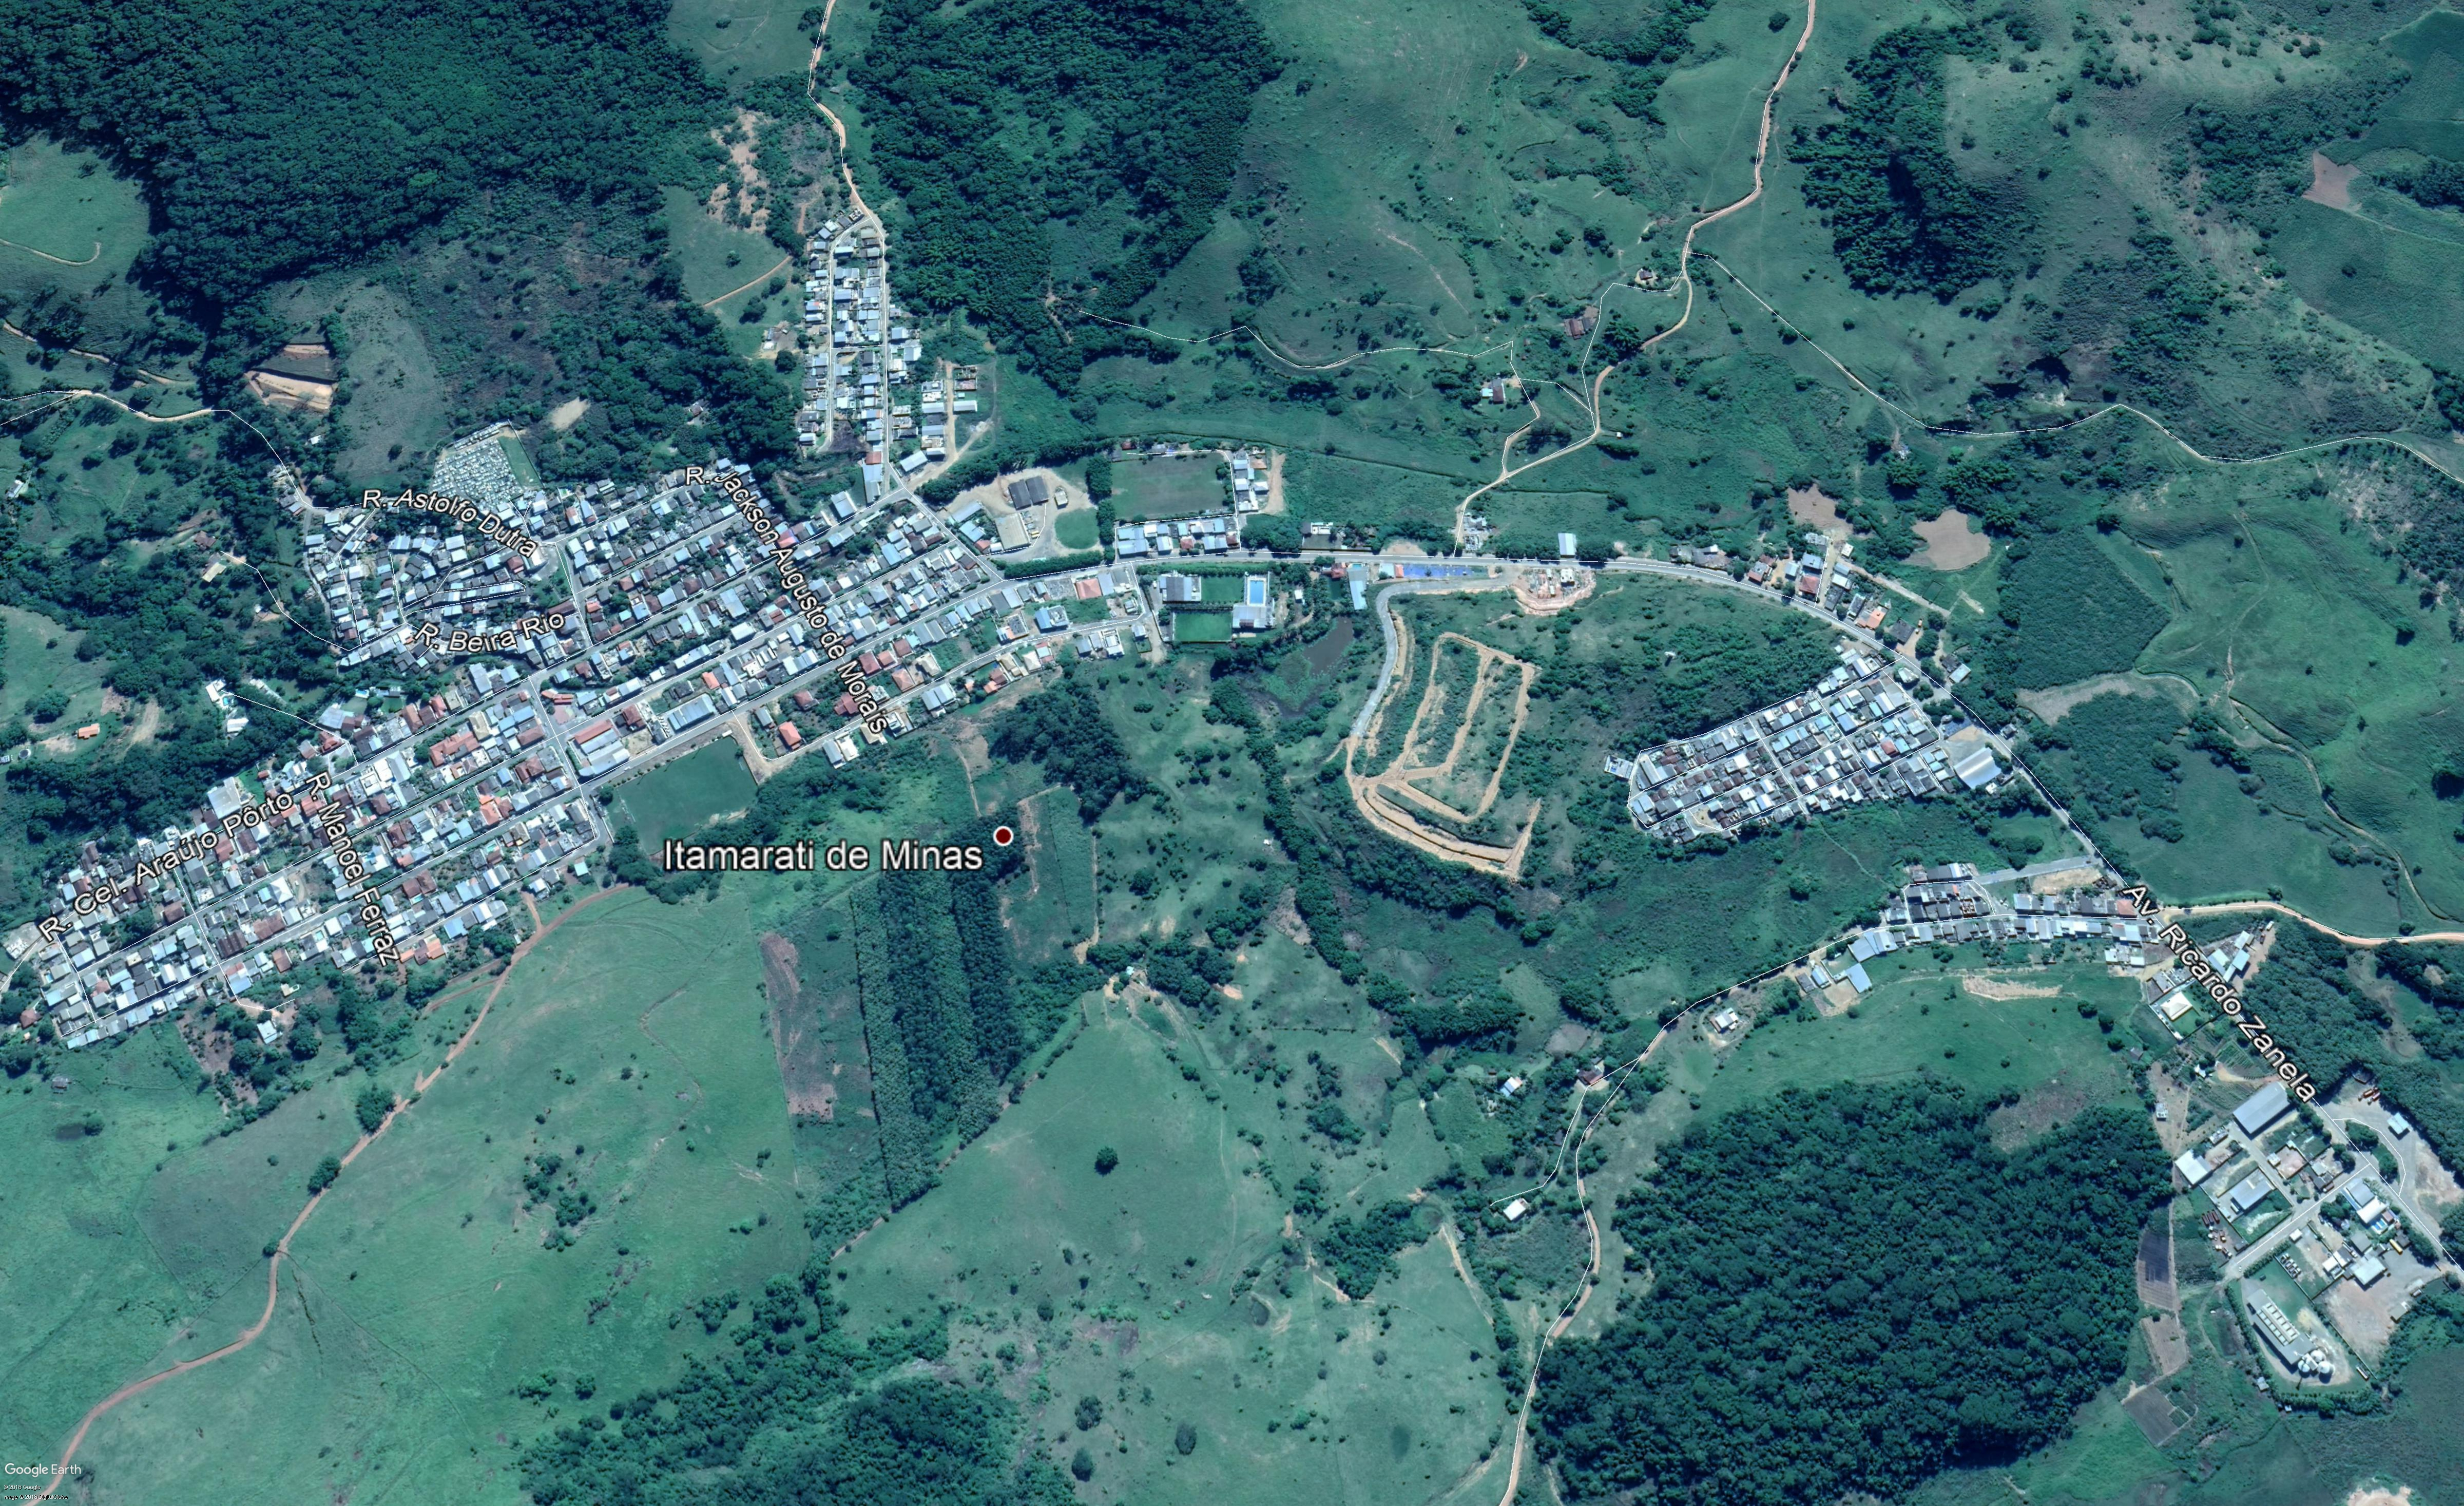 Itamarati de Minas Minas Gerais fonte: public-rf-upload.minhawebradio.net